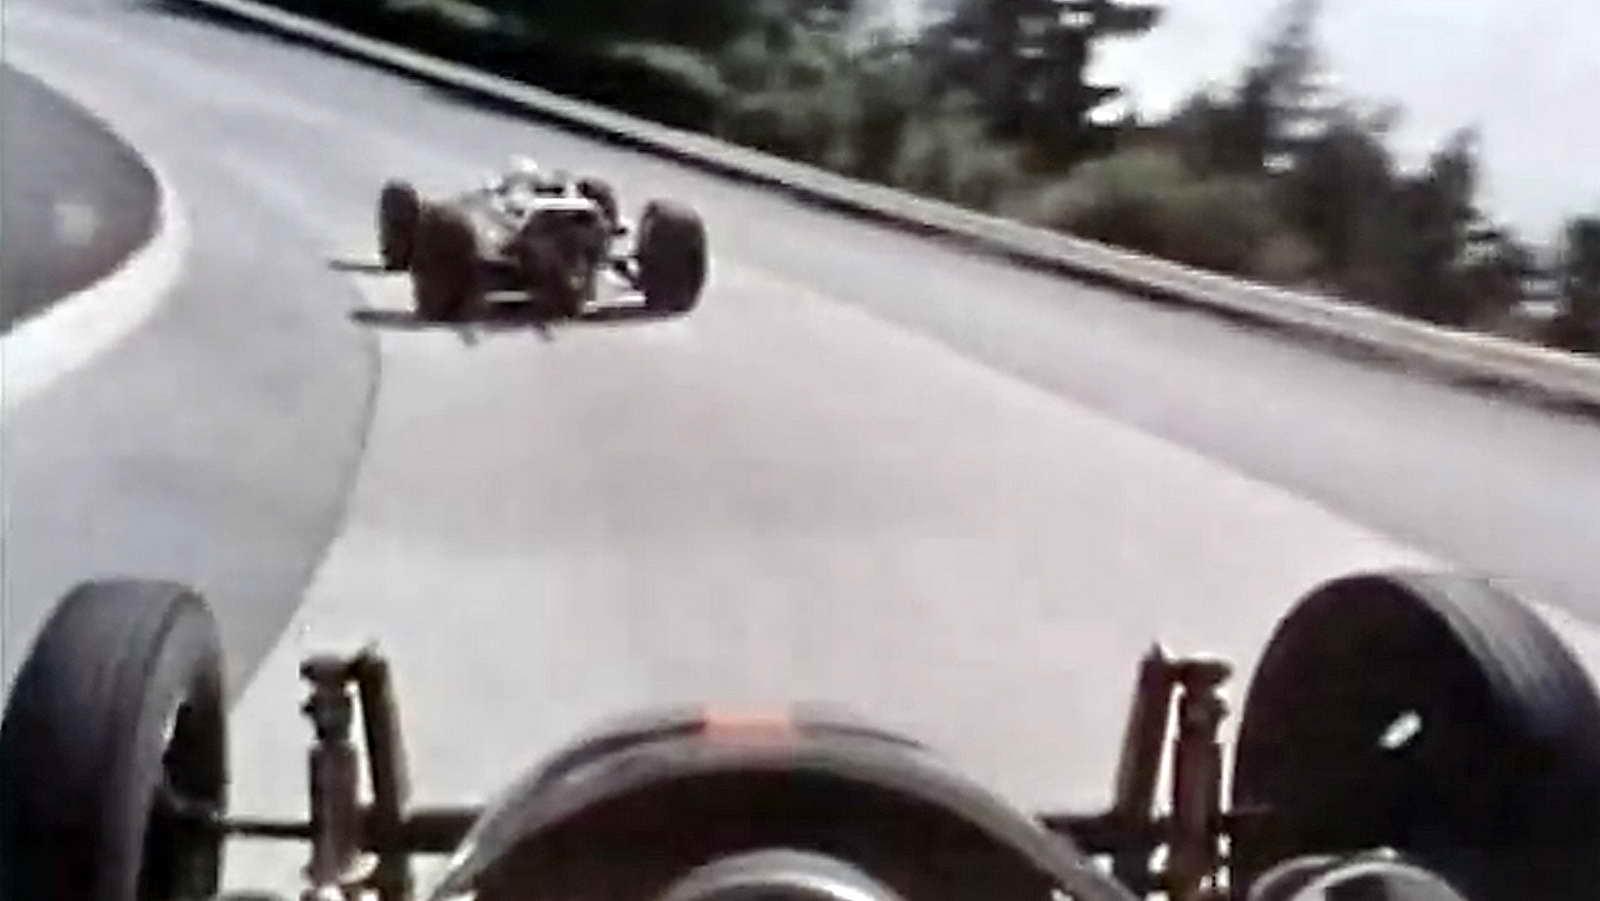 Vuelta_rápida_Nürburgring_Fórmula_1_1967_03